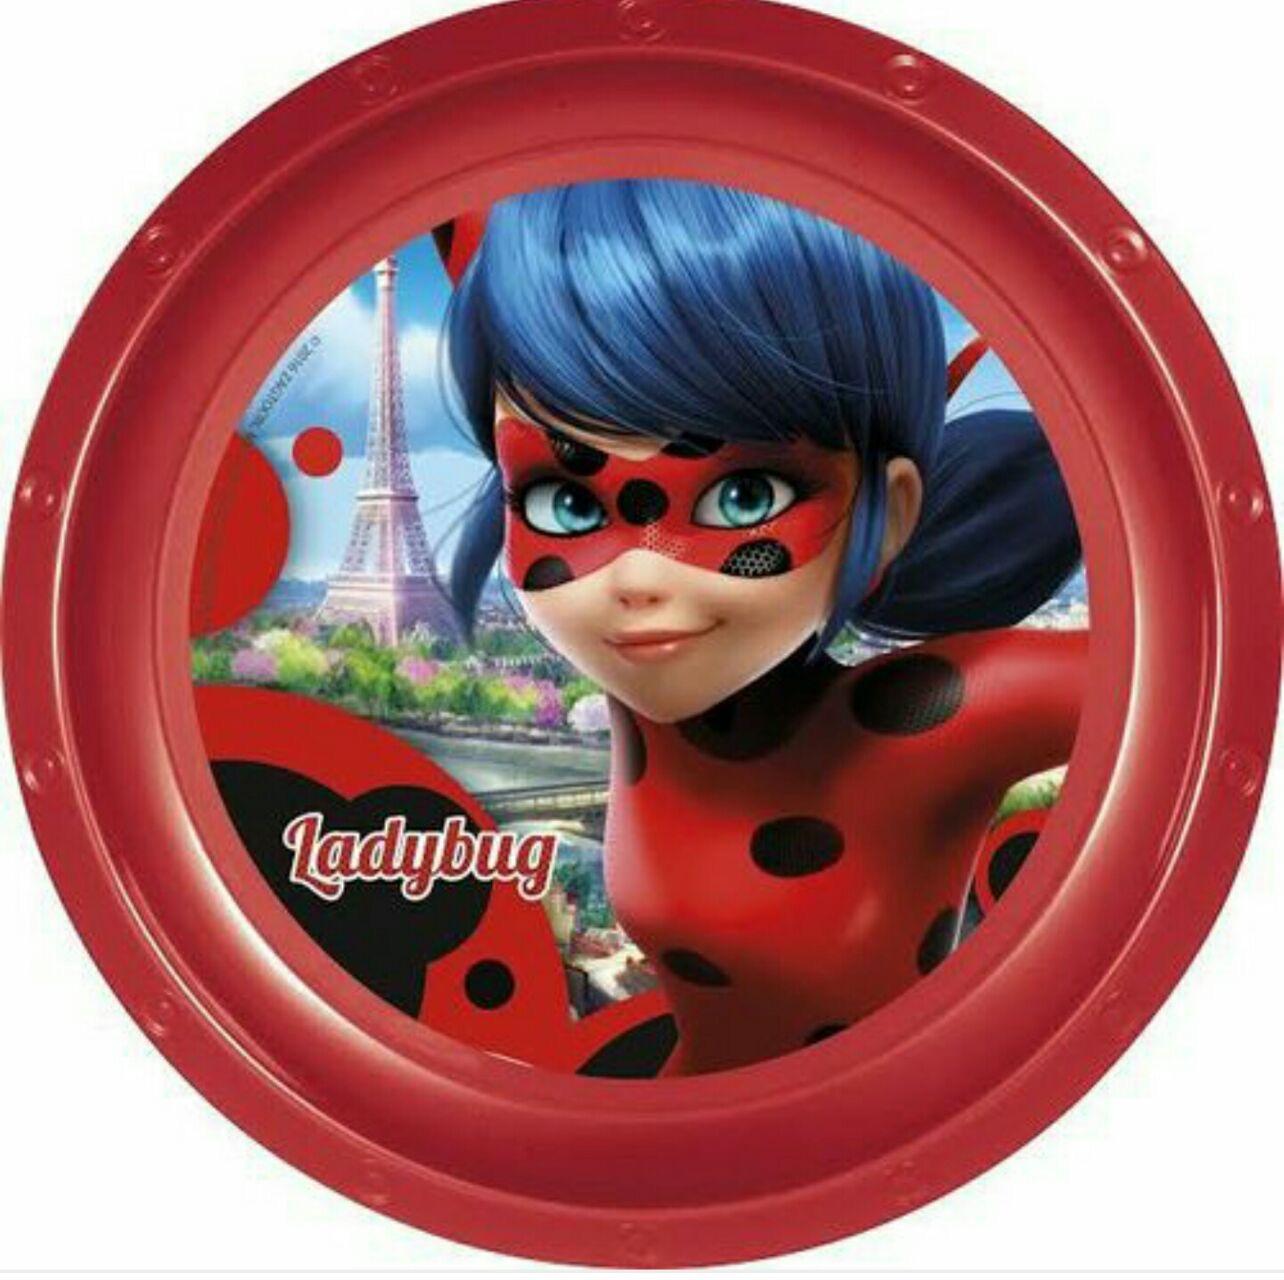 plato ladybug